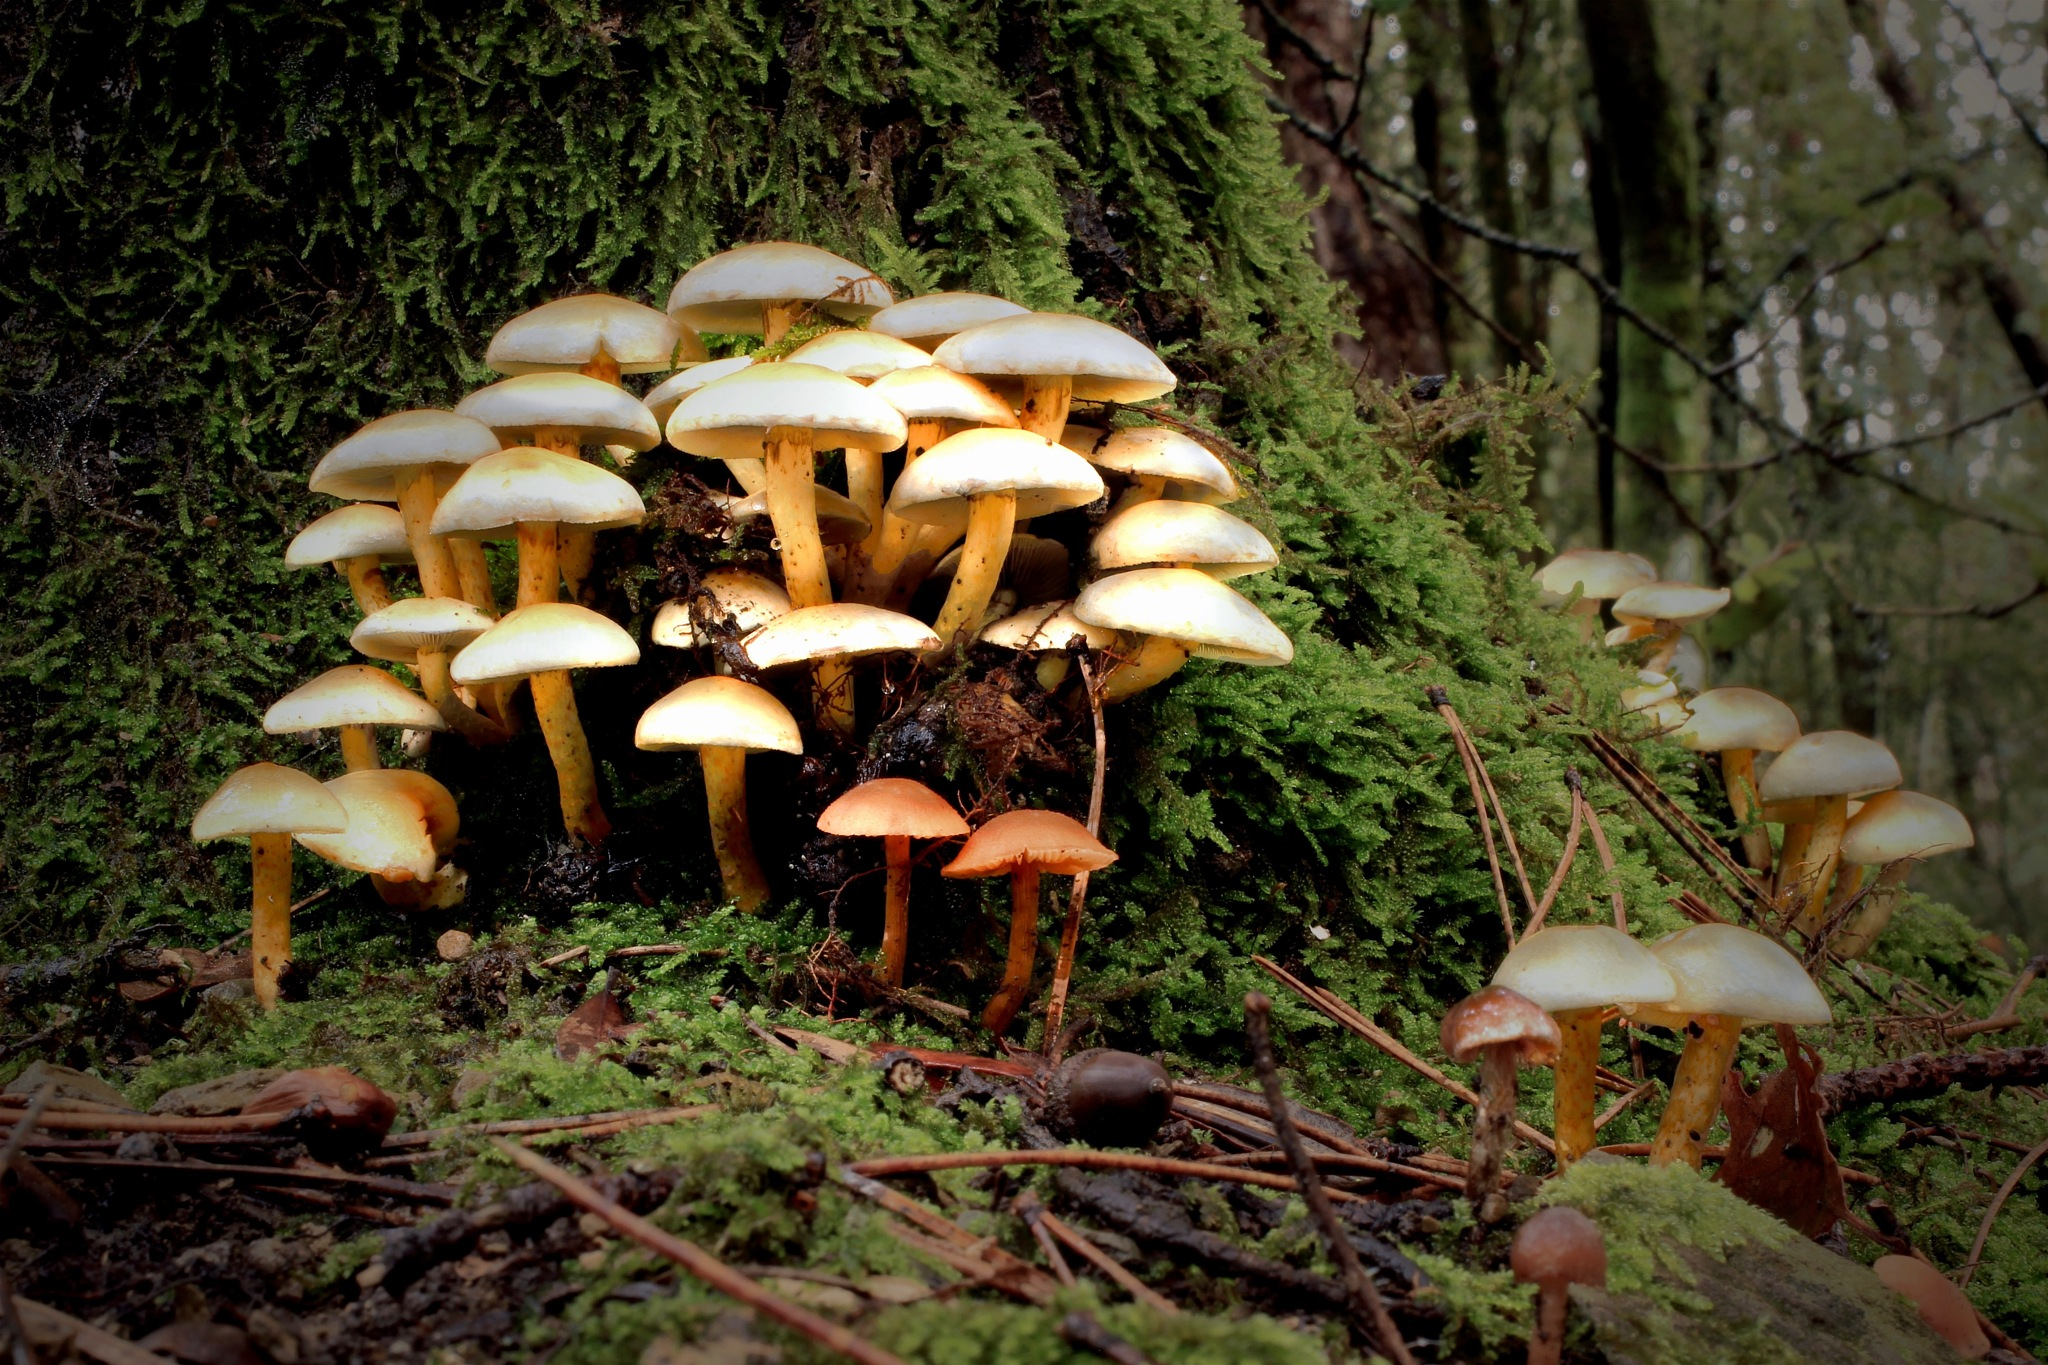 Funghi in Pratomagno by MarkSoetebierVideophotography